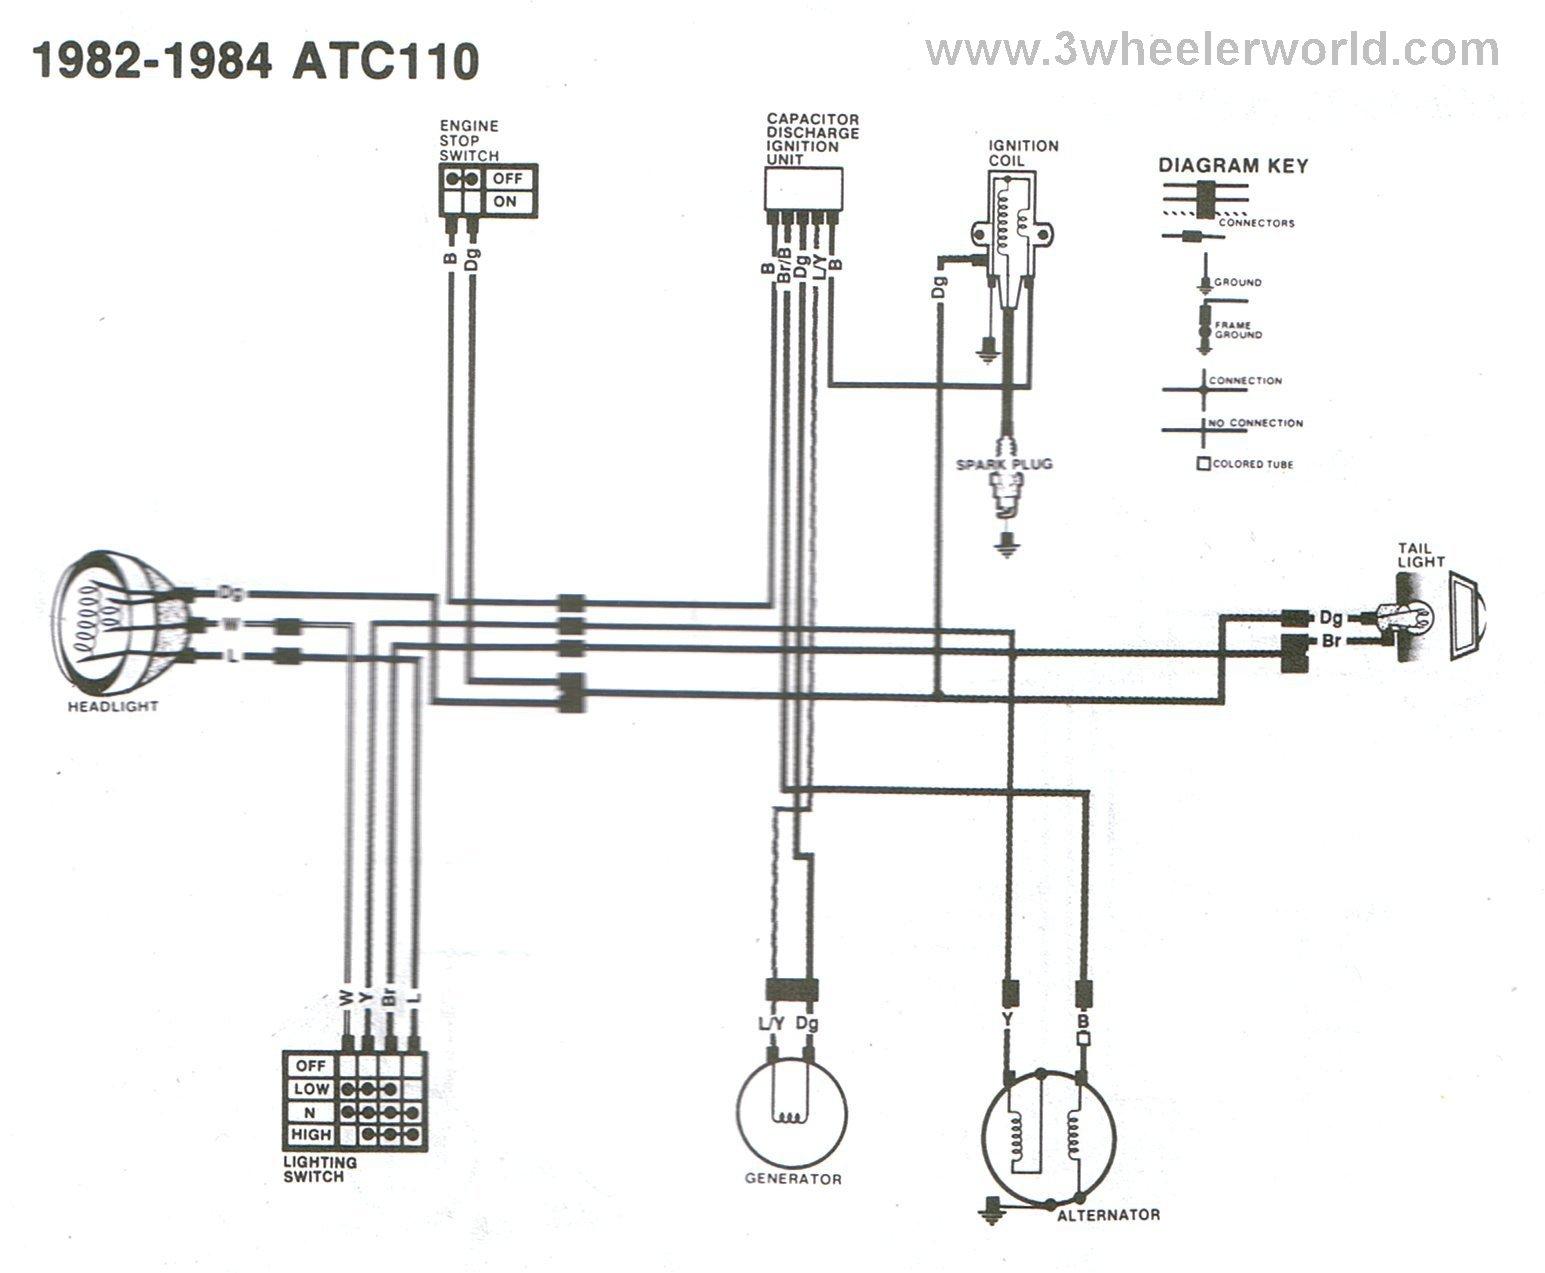 Honda 200x Wiring Diagram - Stop Turn Tail Light Wiring Diagram for Wiring  Diagram SchematicsWiring Diagram Schematics